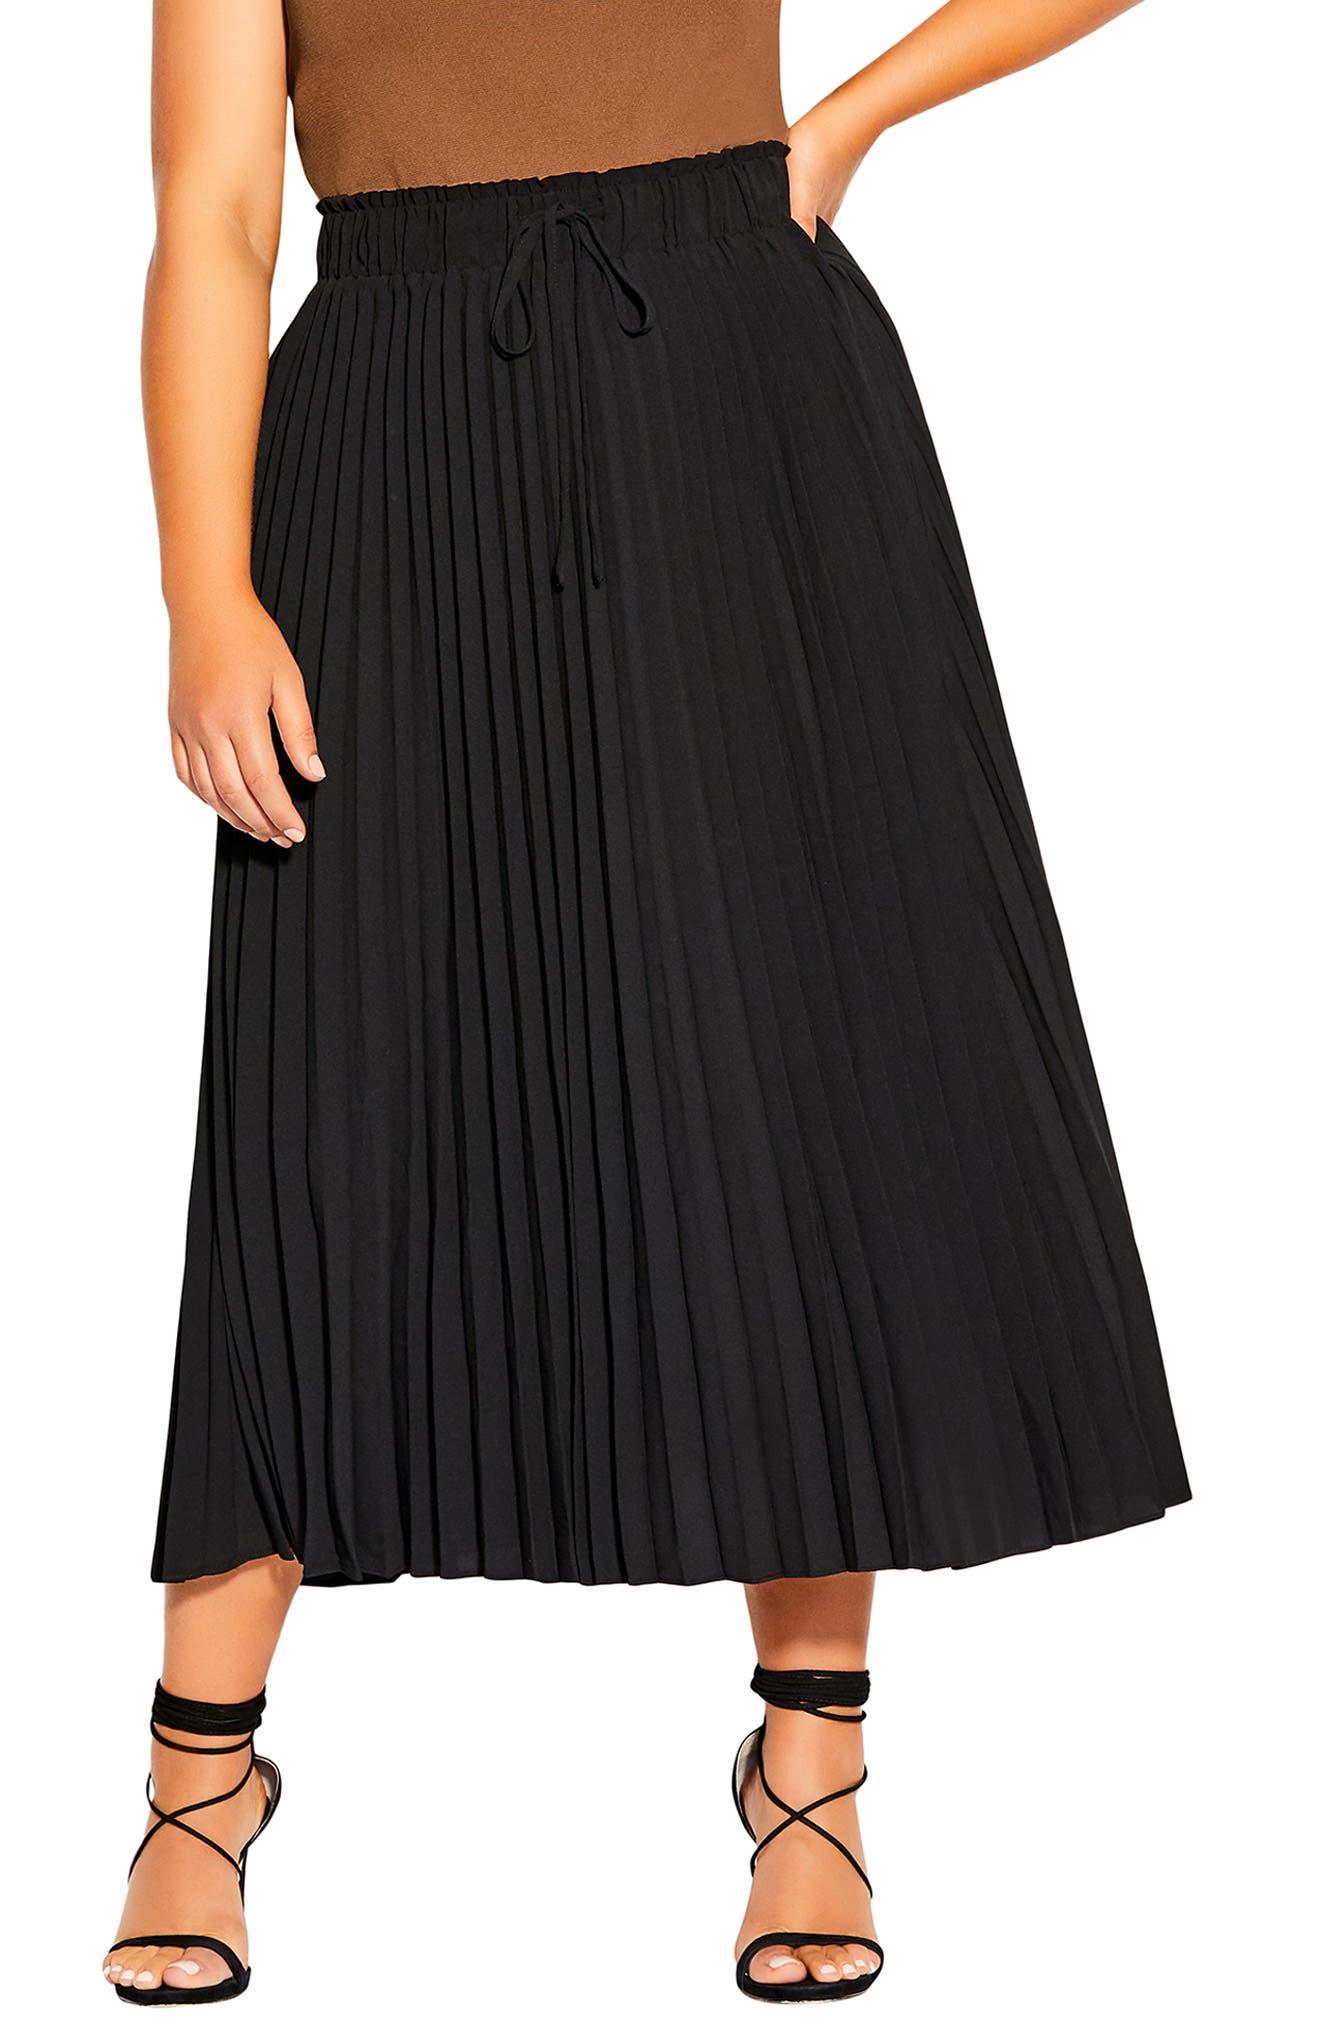 Plus Size Evening Skirts